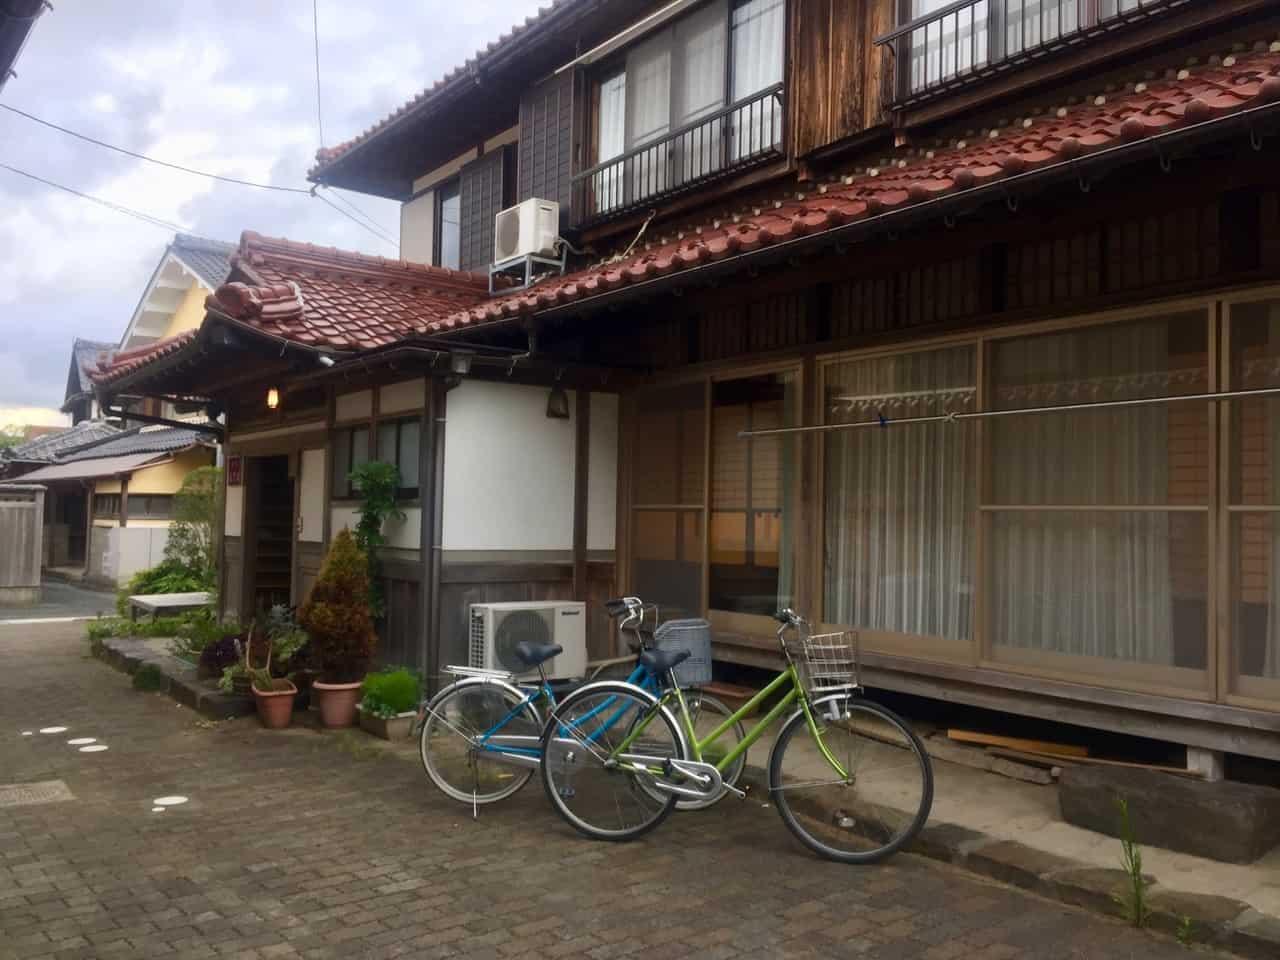 Accommodation in Wakasa Takahama: Ryokan, Hotel, Villa or Minshuku?